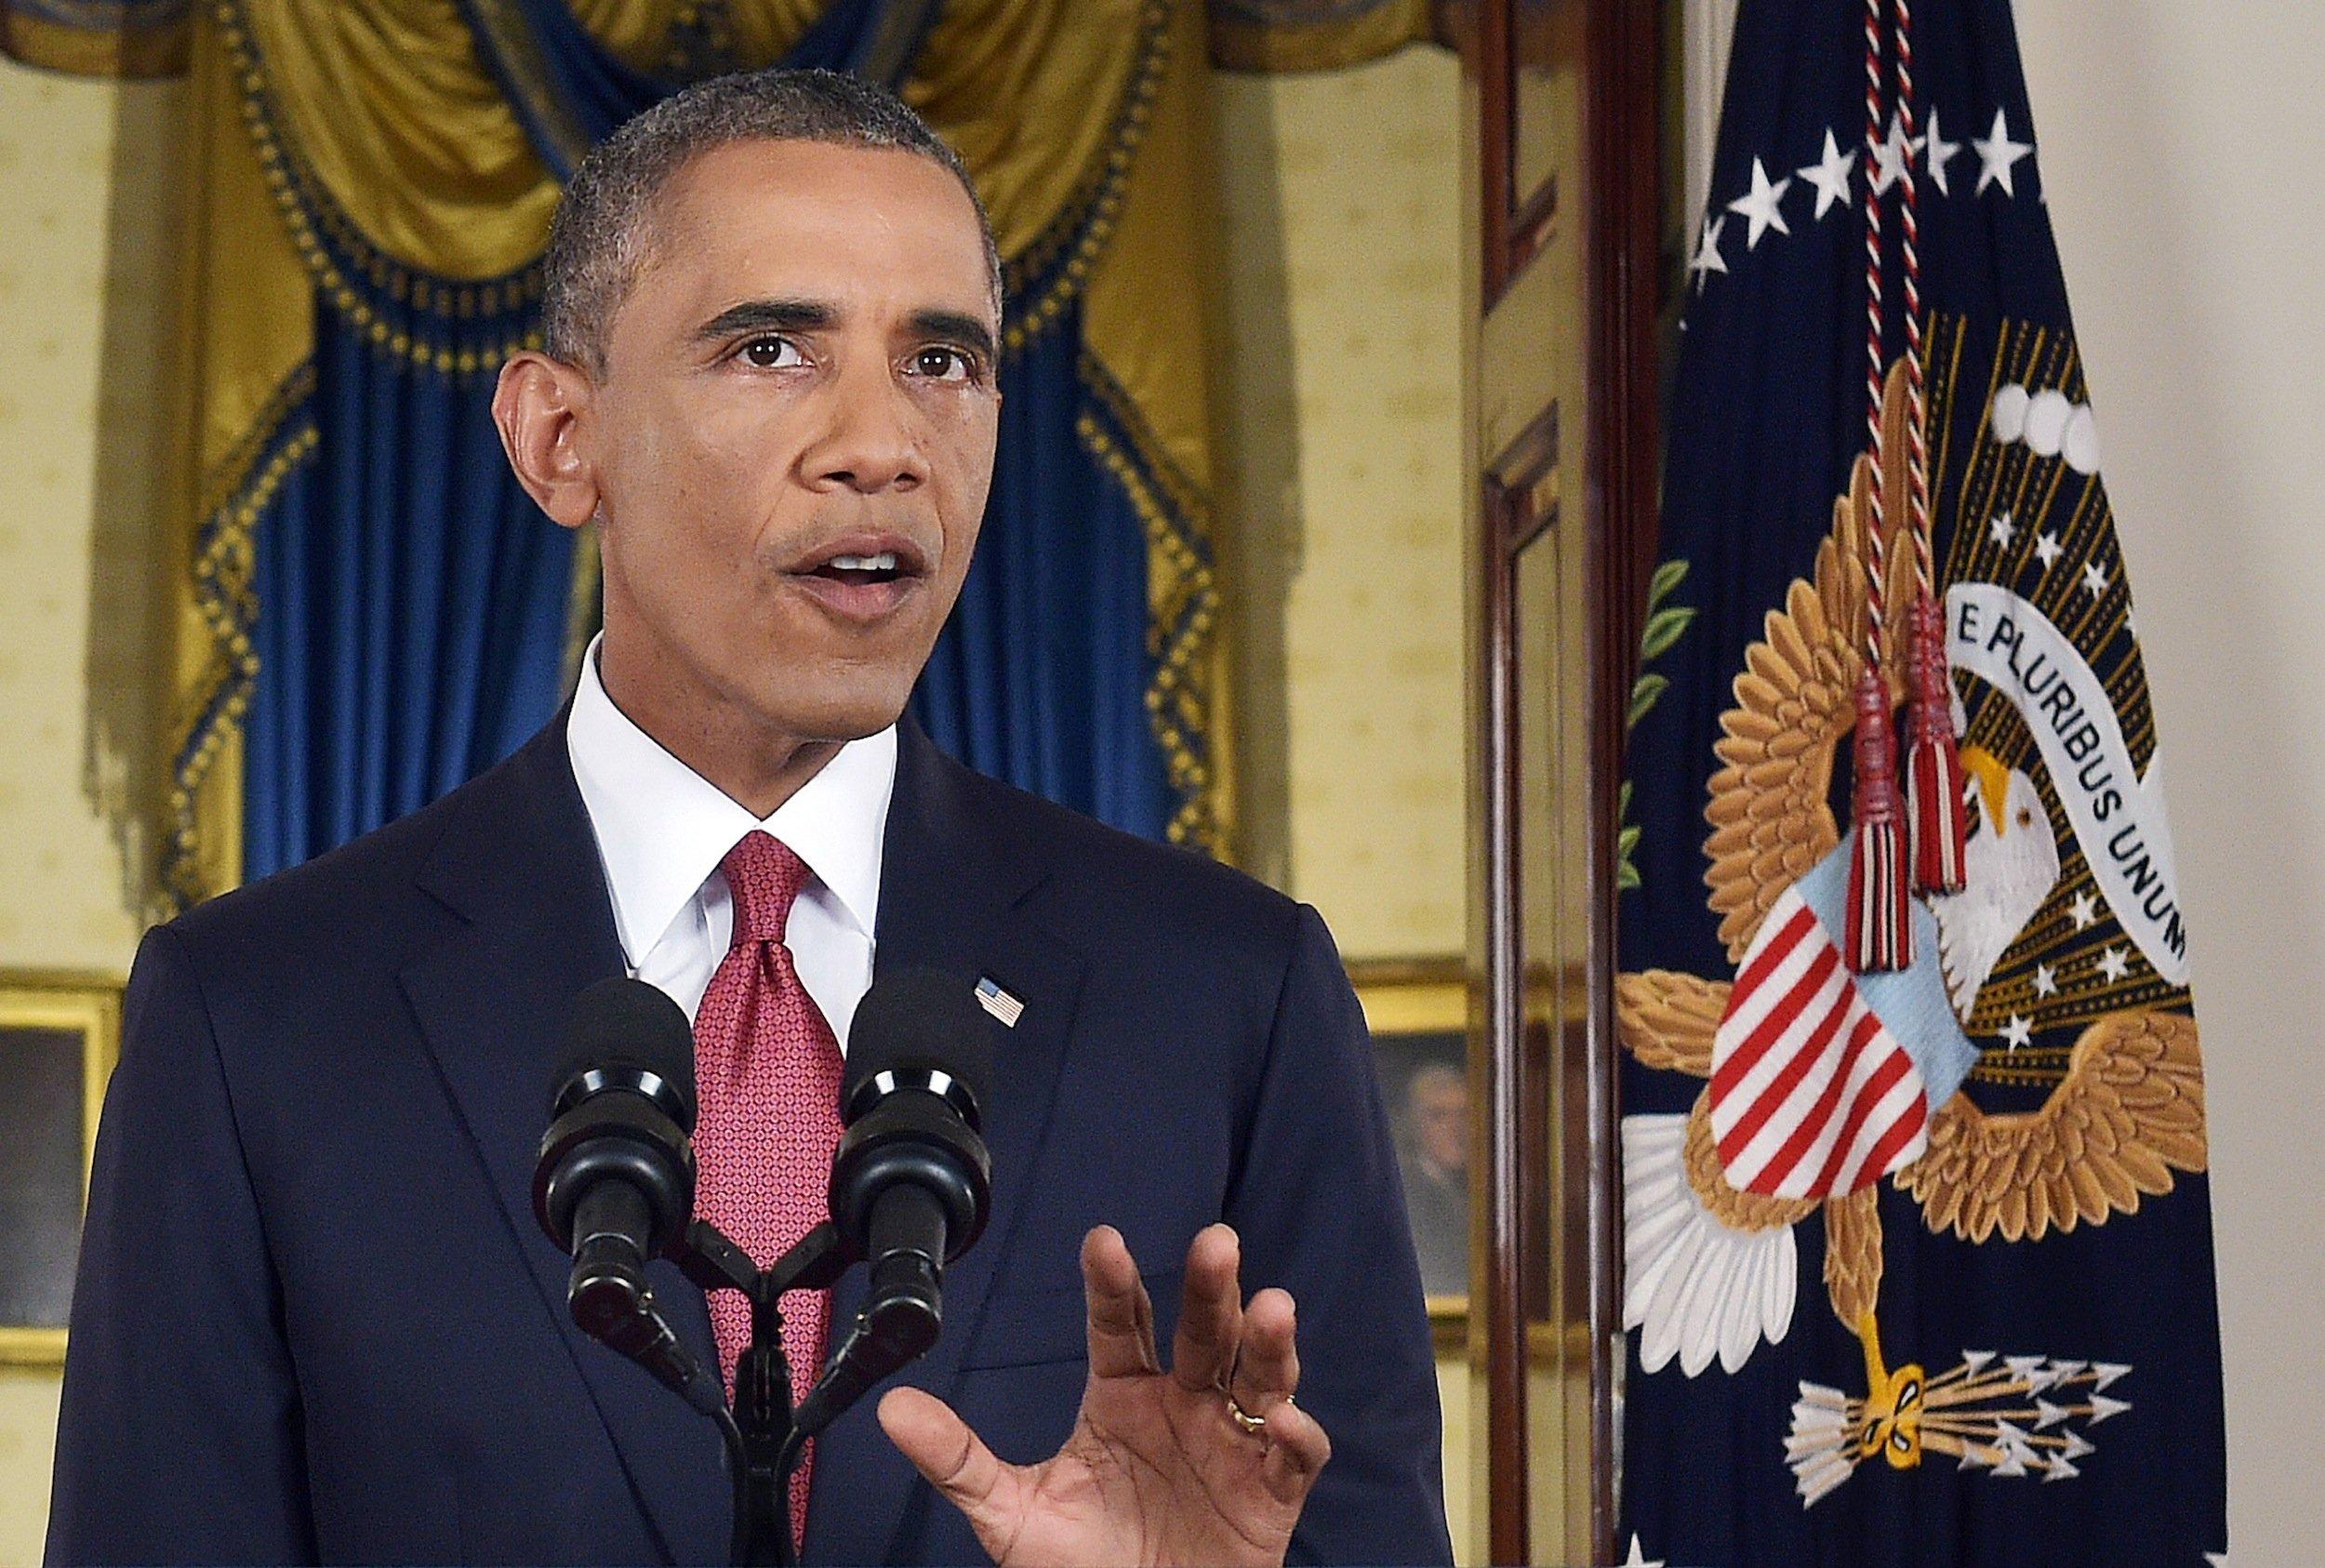 Obama addresses the nation